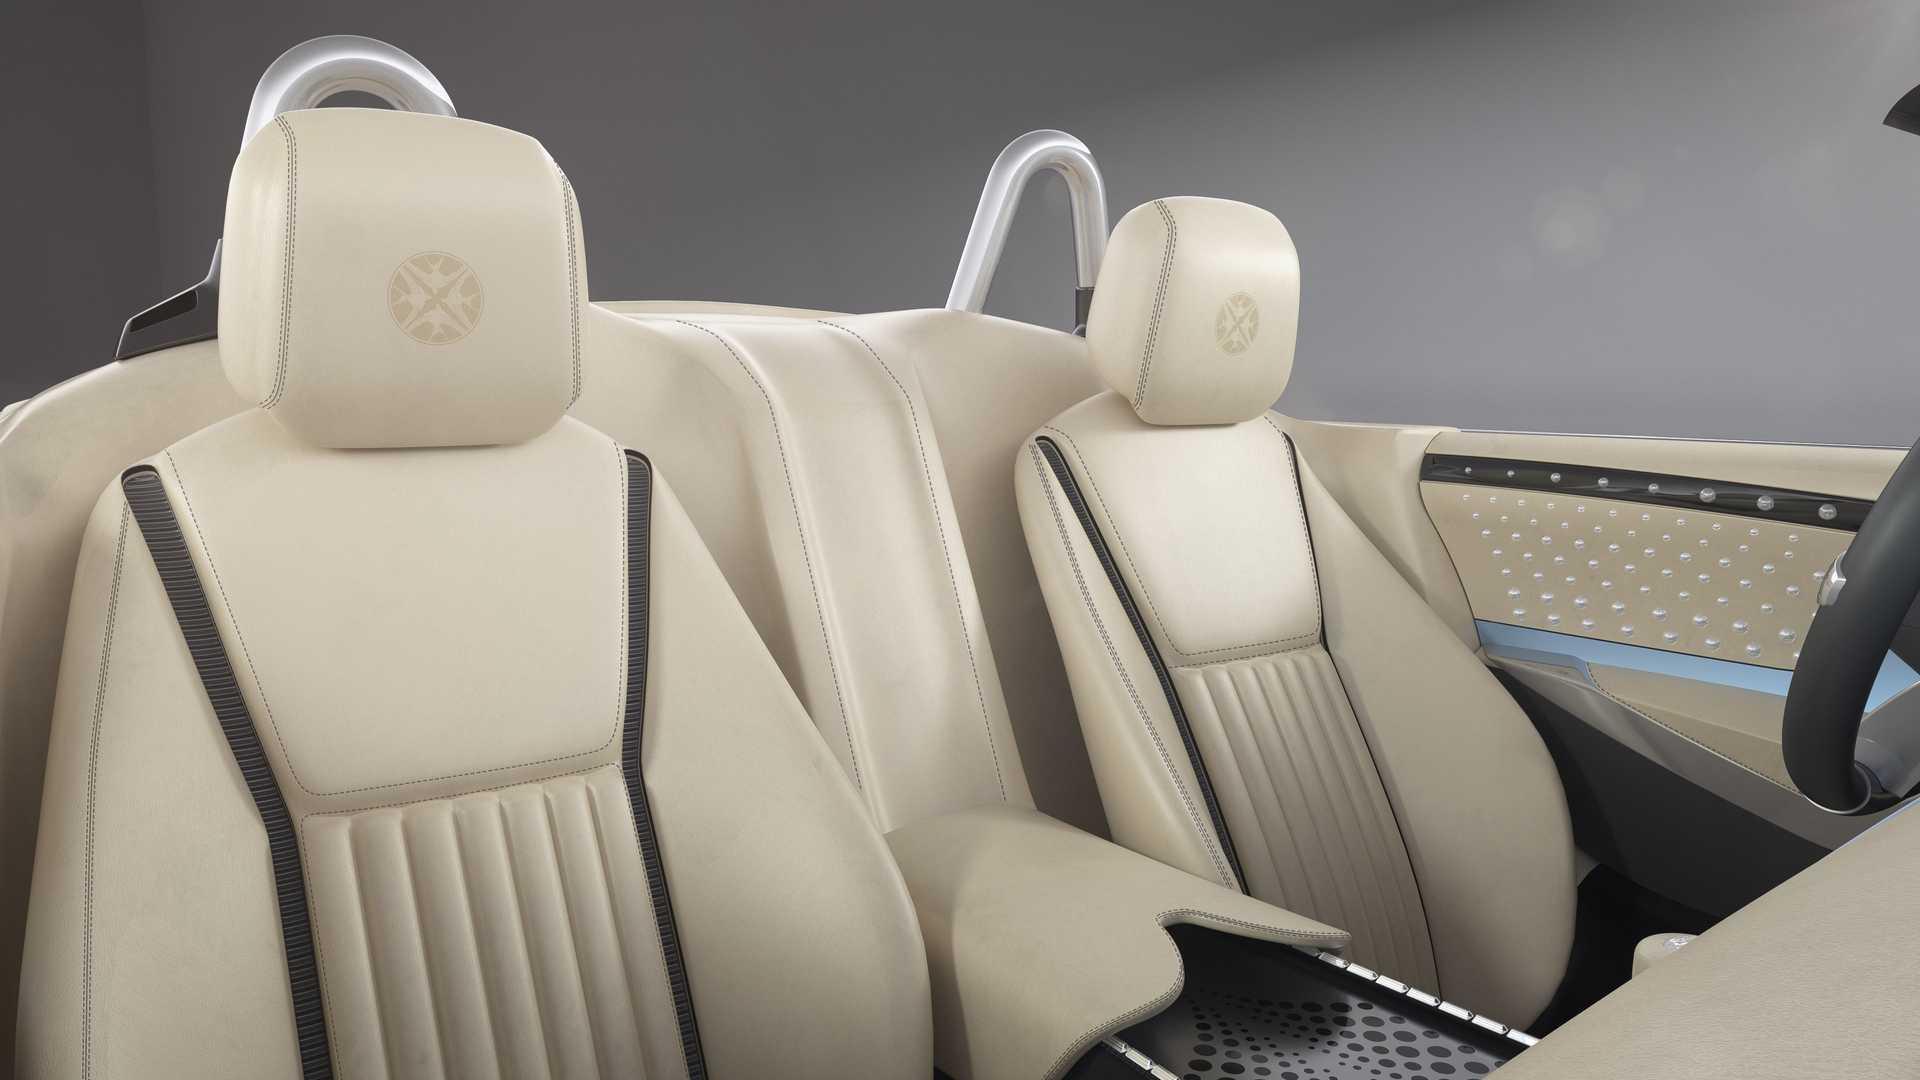 Ares-Design-Wami-Lalique-Spyder-36